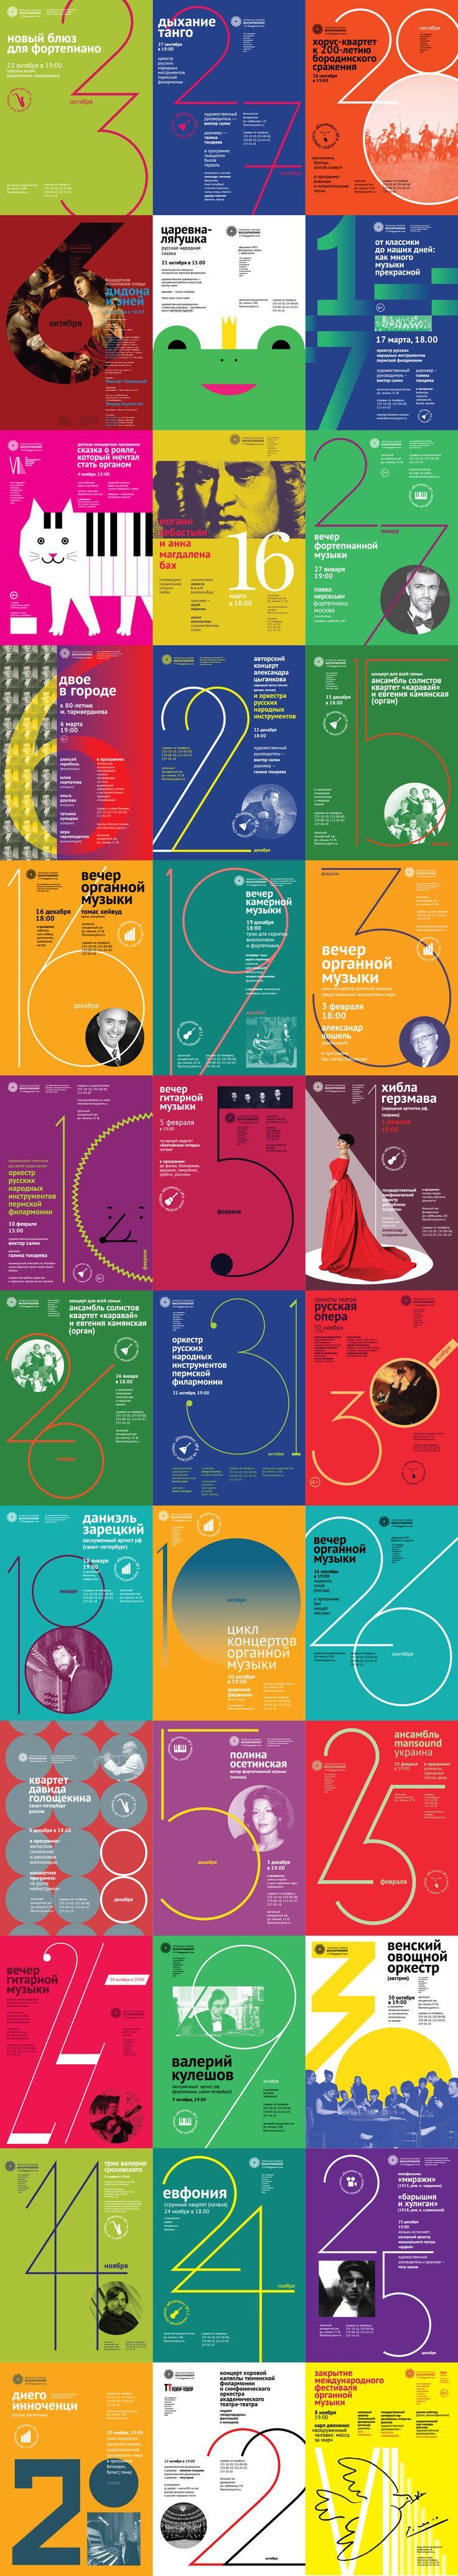 Perm Philharmonic Season 77 Playbills by Studio GD (http://abcgd.livejournal.com/24404.html)